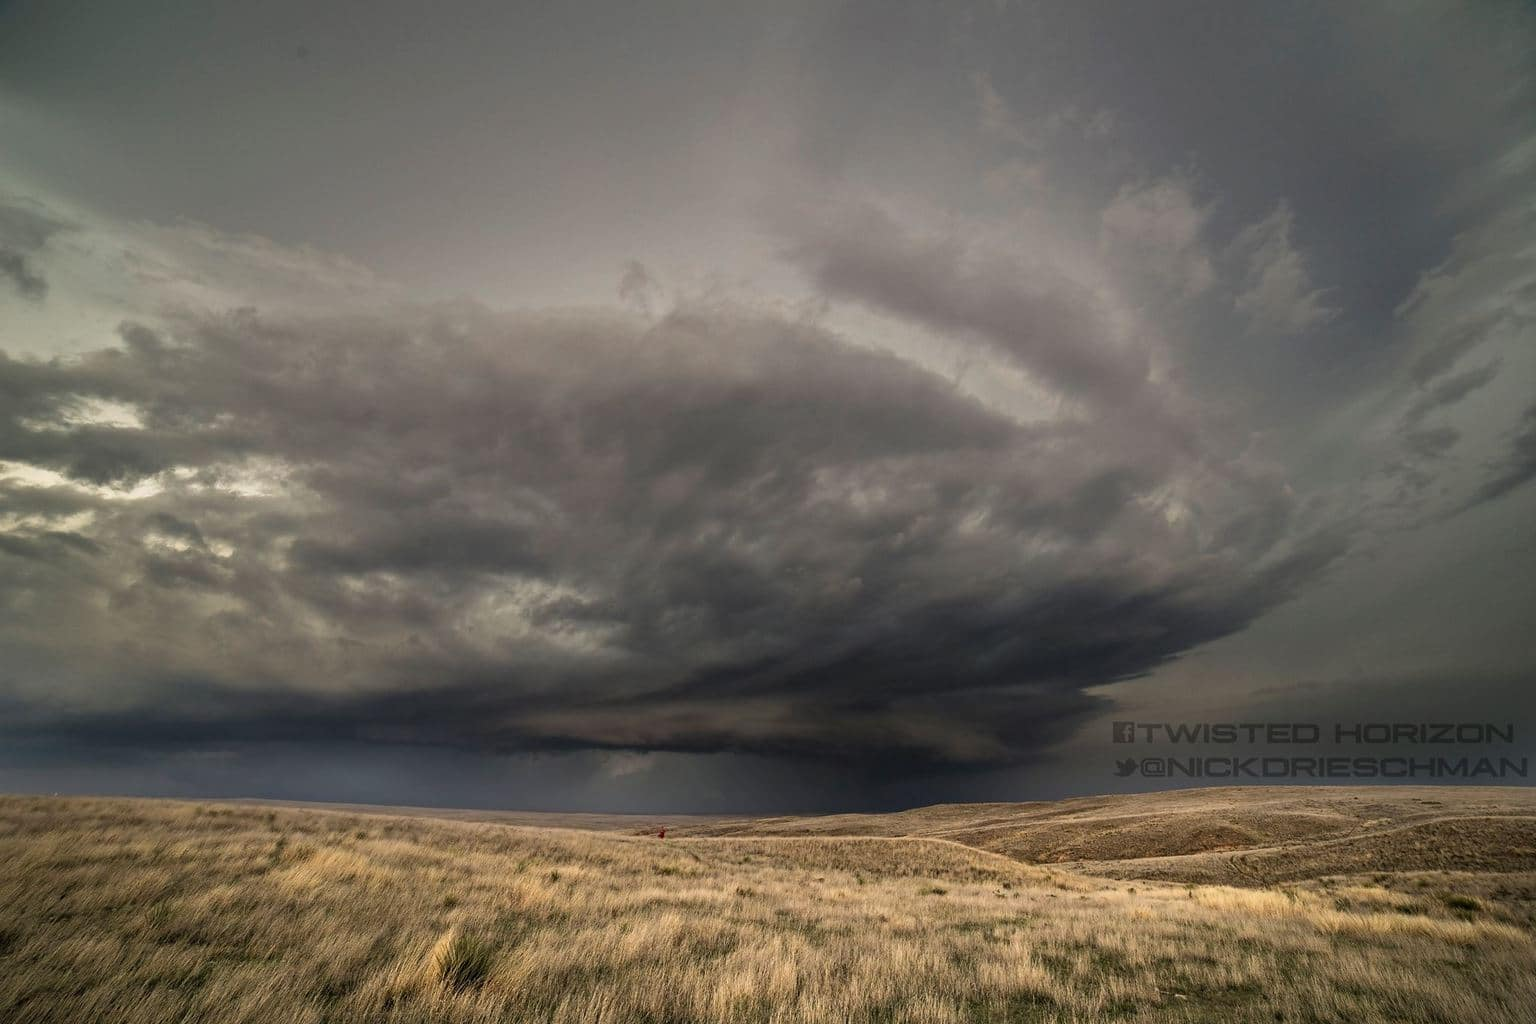 A peaceful scene near Tribune Kansas on a pretty storm over the grasslands 4-15-2015